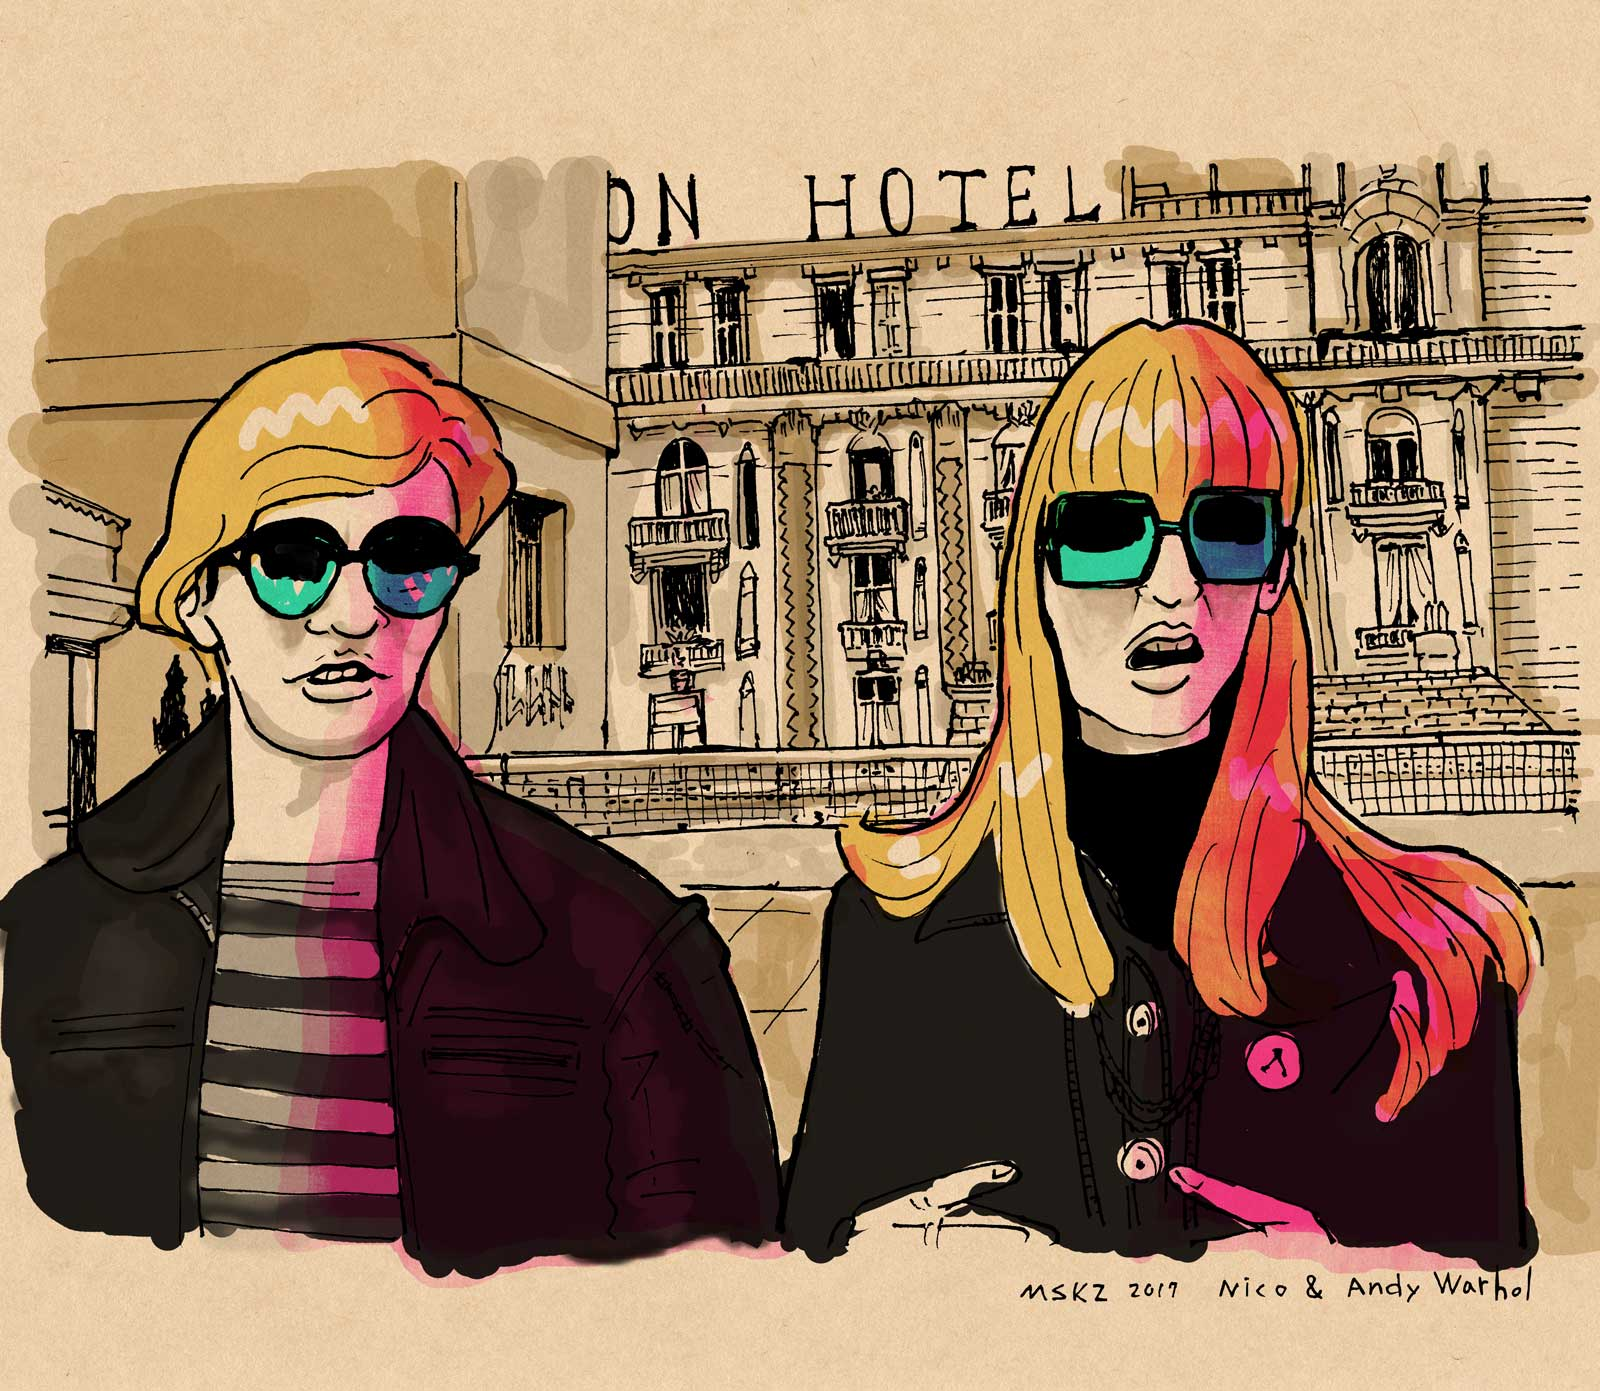 Nico & Andy Warhol